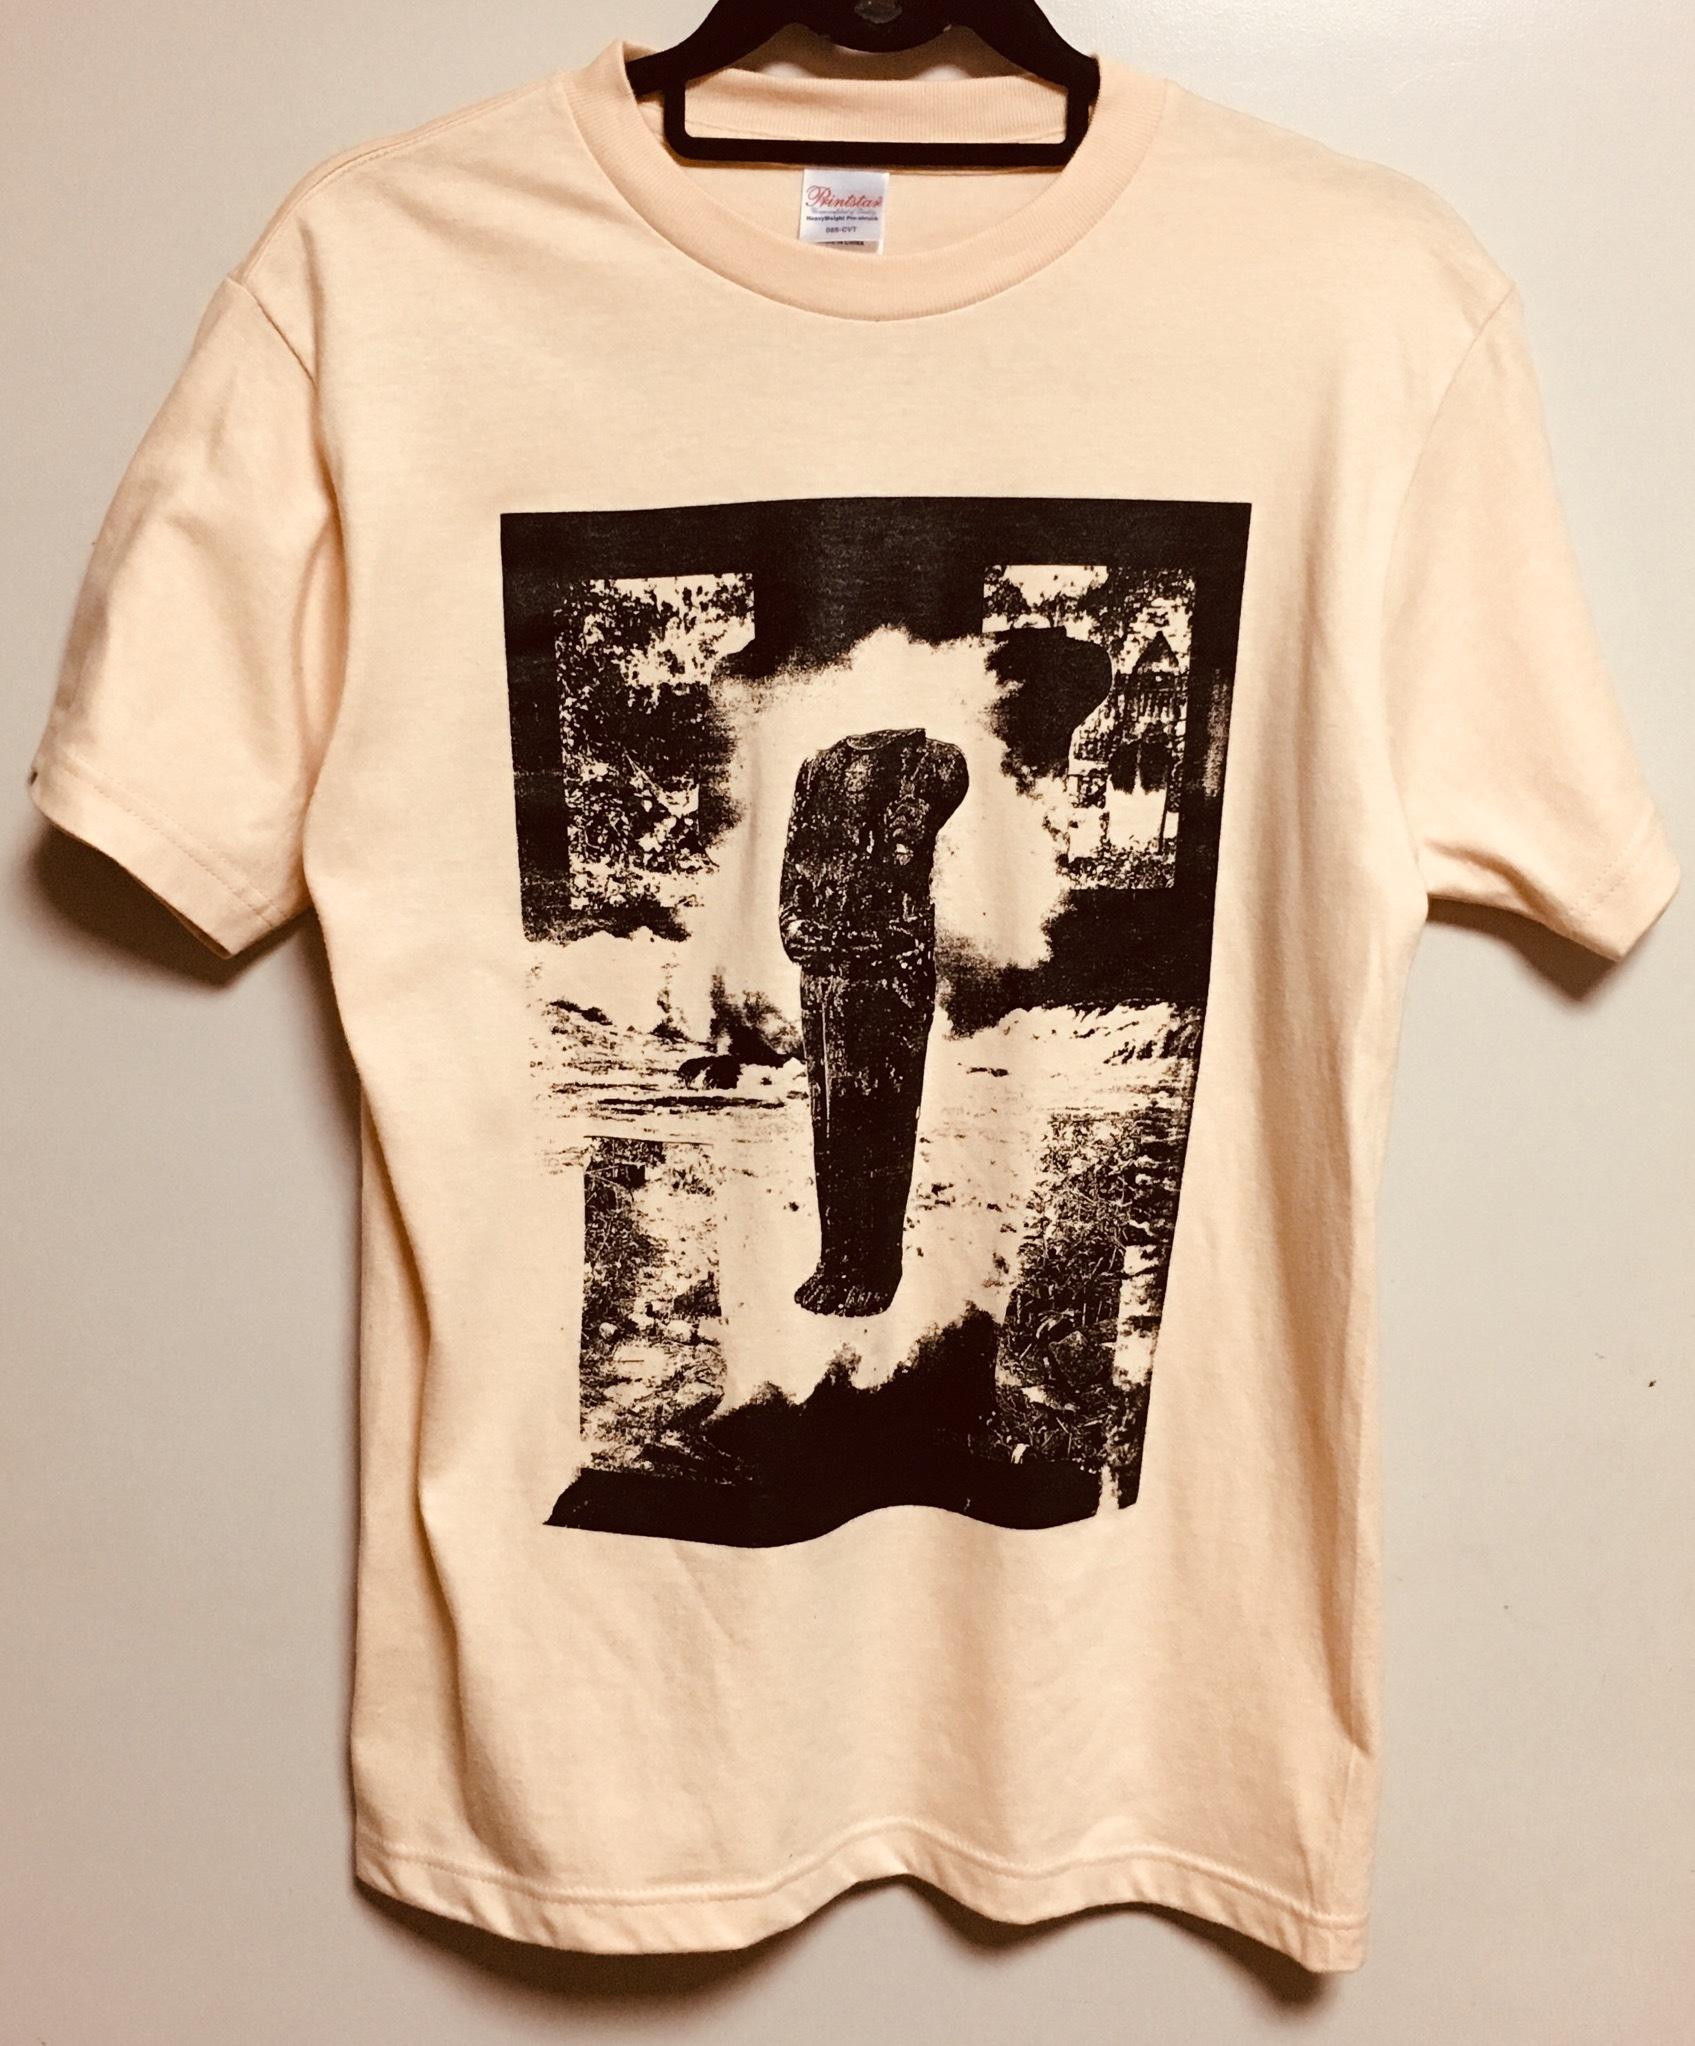 Amplified Humans Festival / Uplink Screening Edition - (Tshirt)